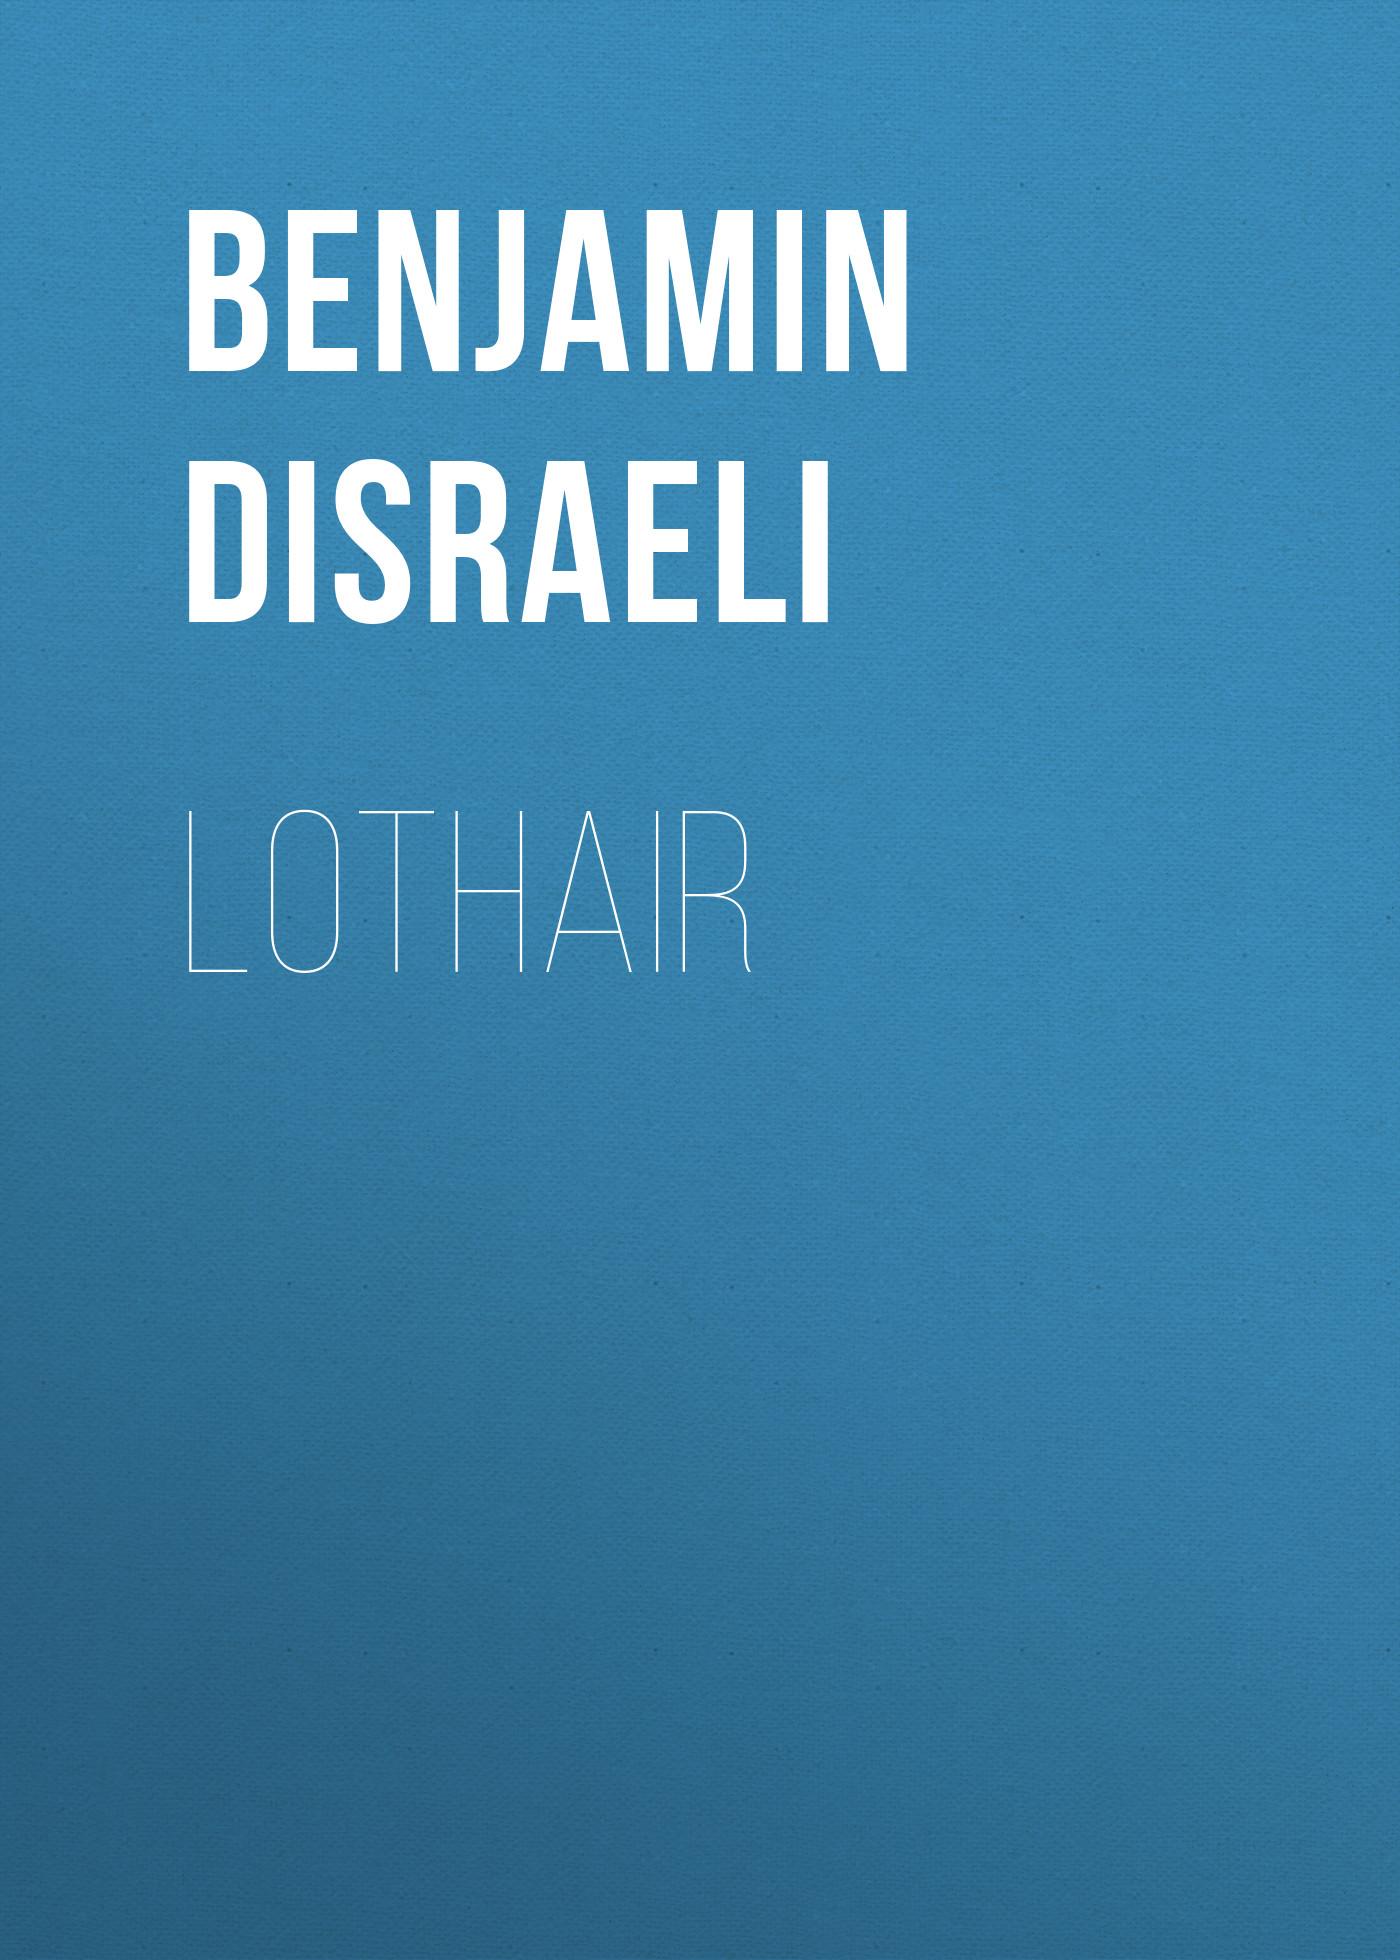 Benjamin Disraeli Lothair benjamin disraeli lothair